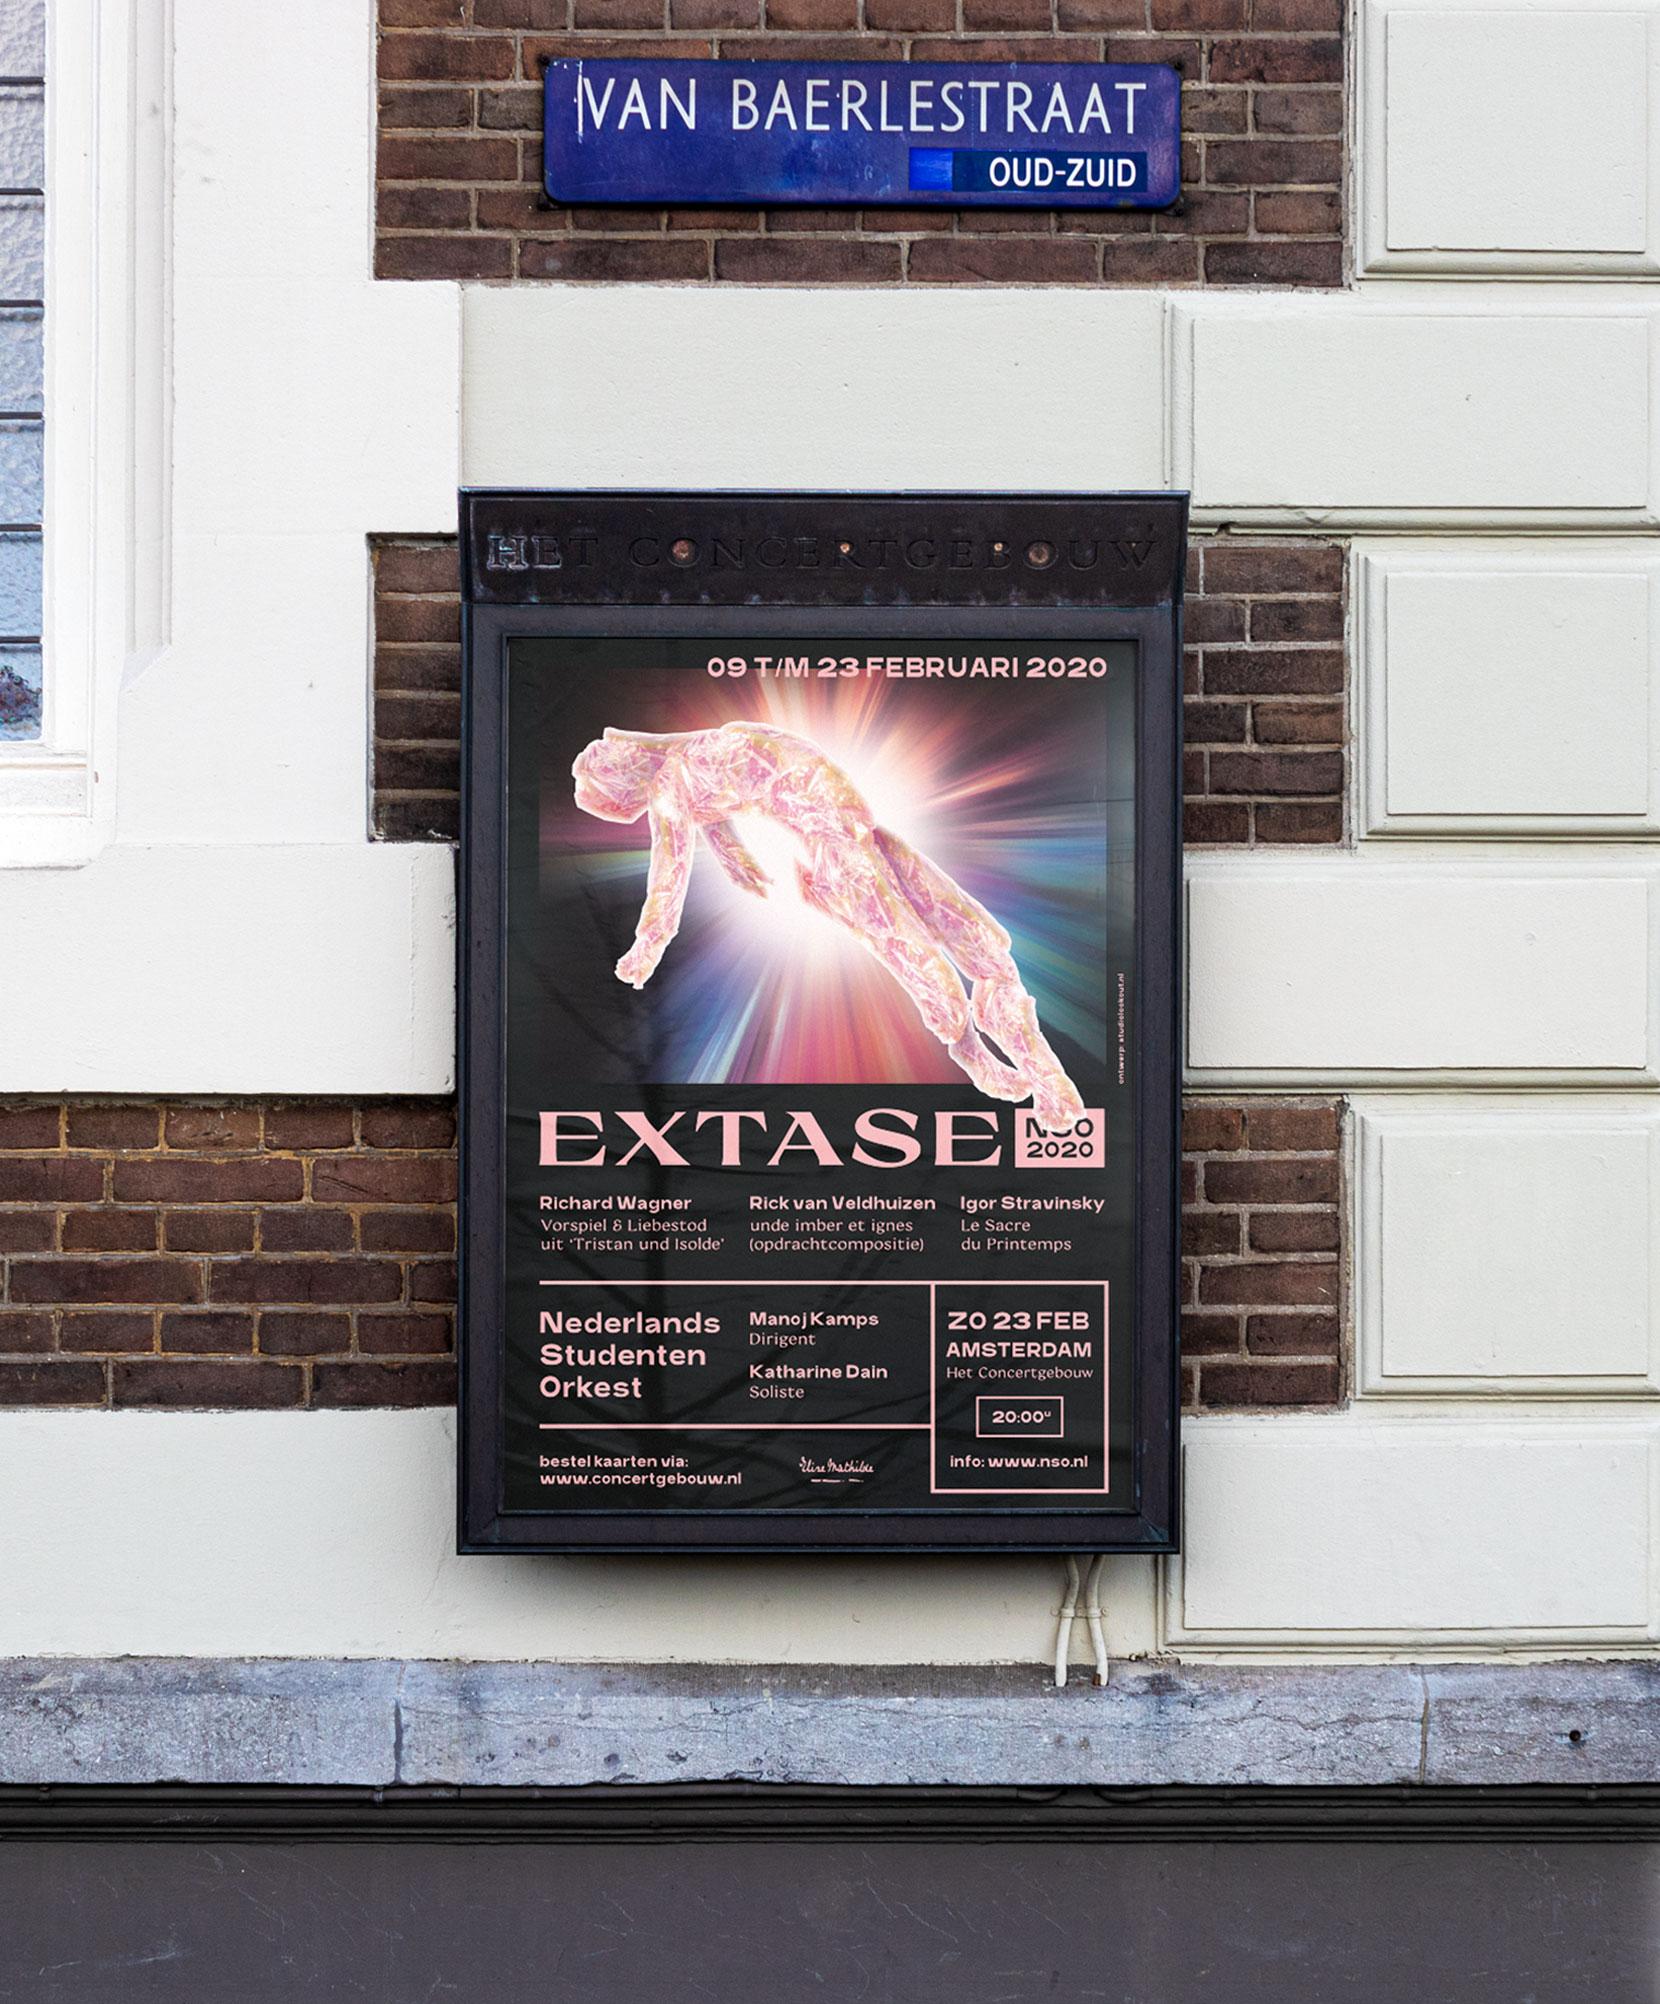 Nederlands Studenten Orkest 2020 - Extase - Tourposter Concertgebouw Amsterdam